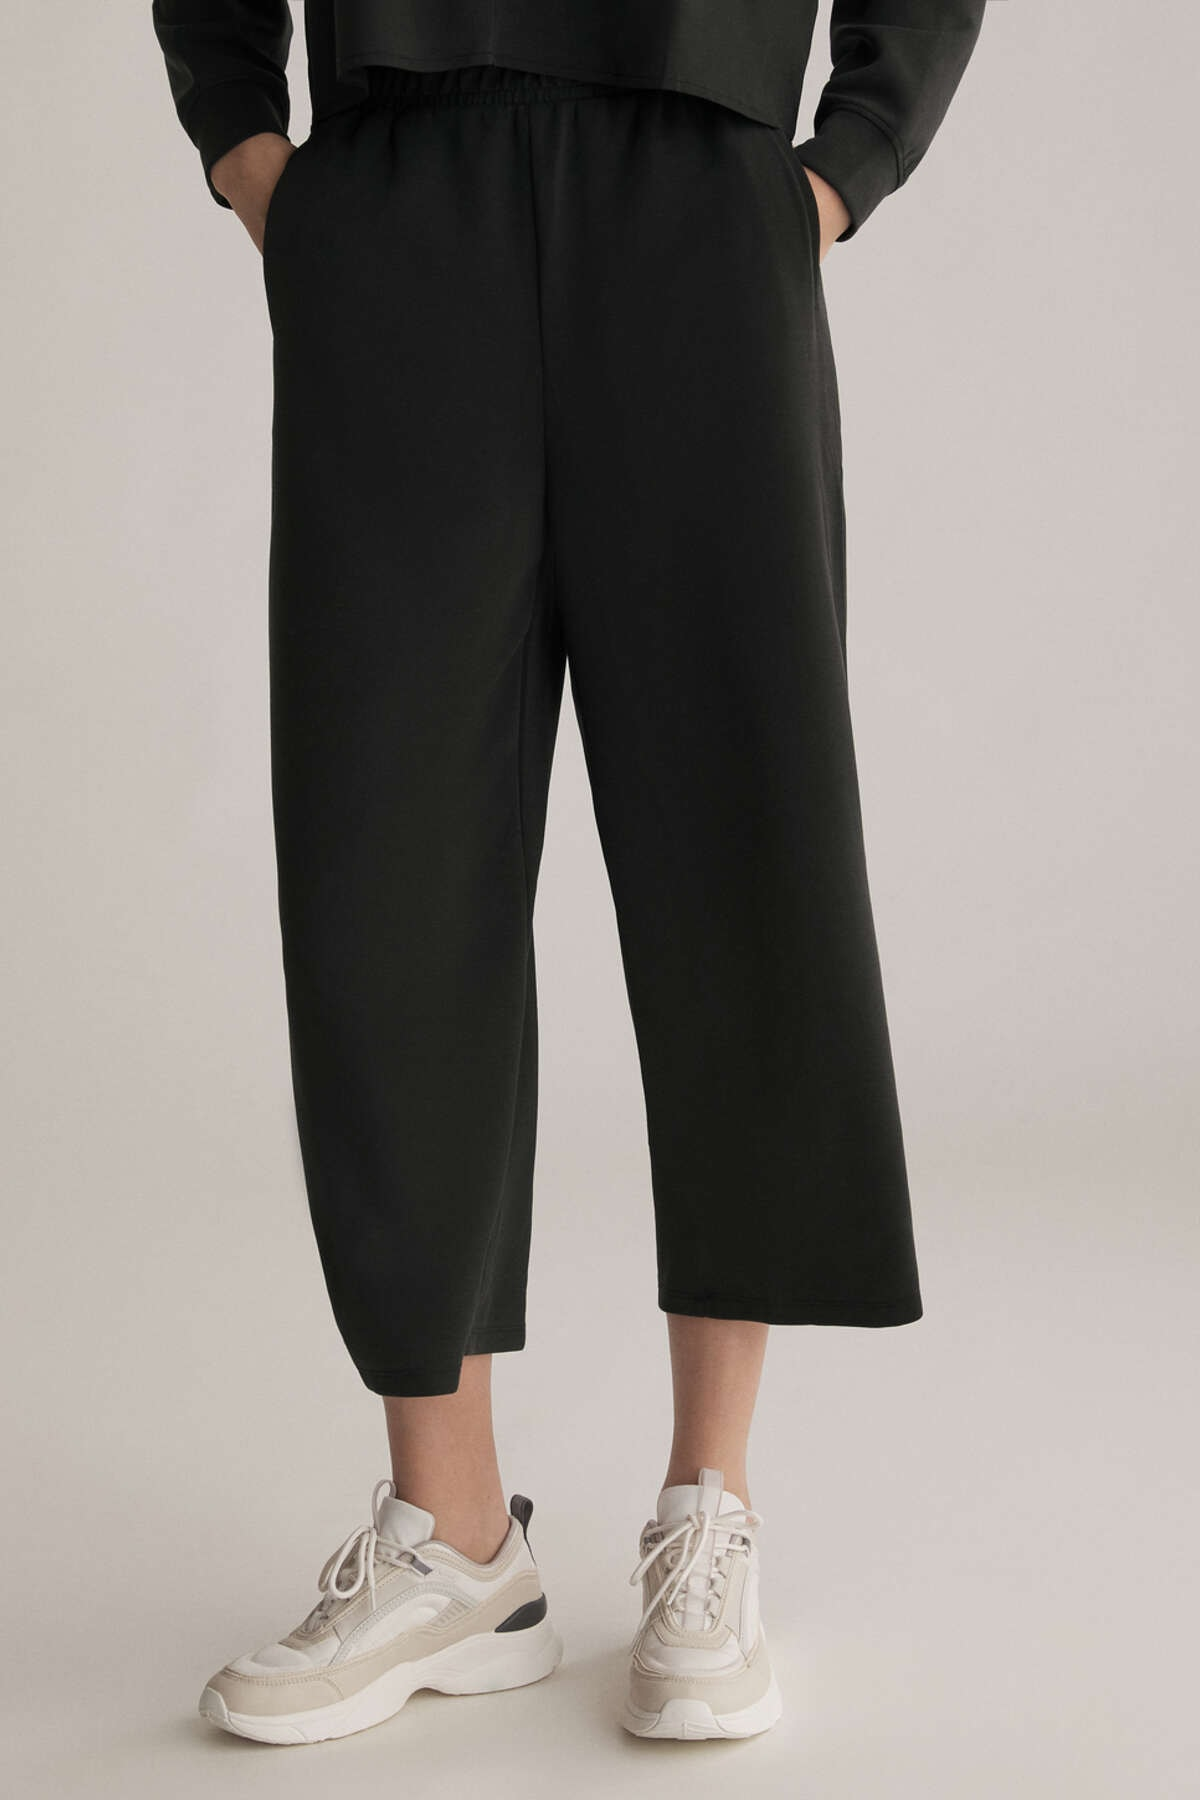 Oysho Kadın Modal Culotte Pantolon Siyah 31237666 1